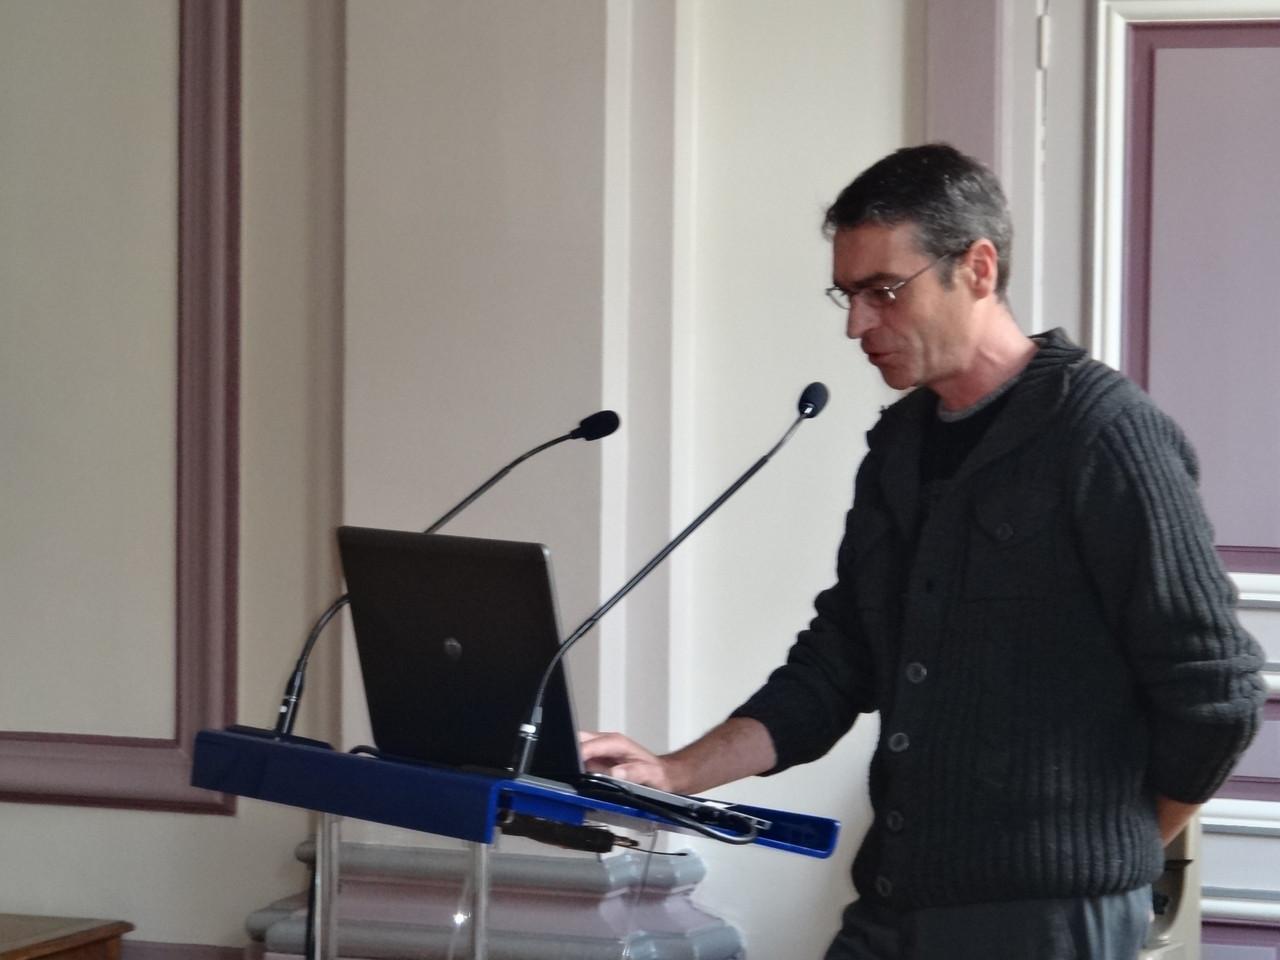 Laurent Duvette